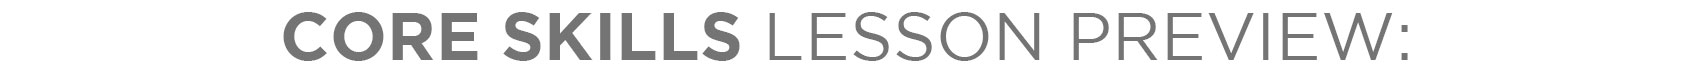 core skills lesson preview join neostock elite header